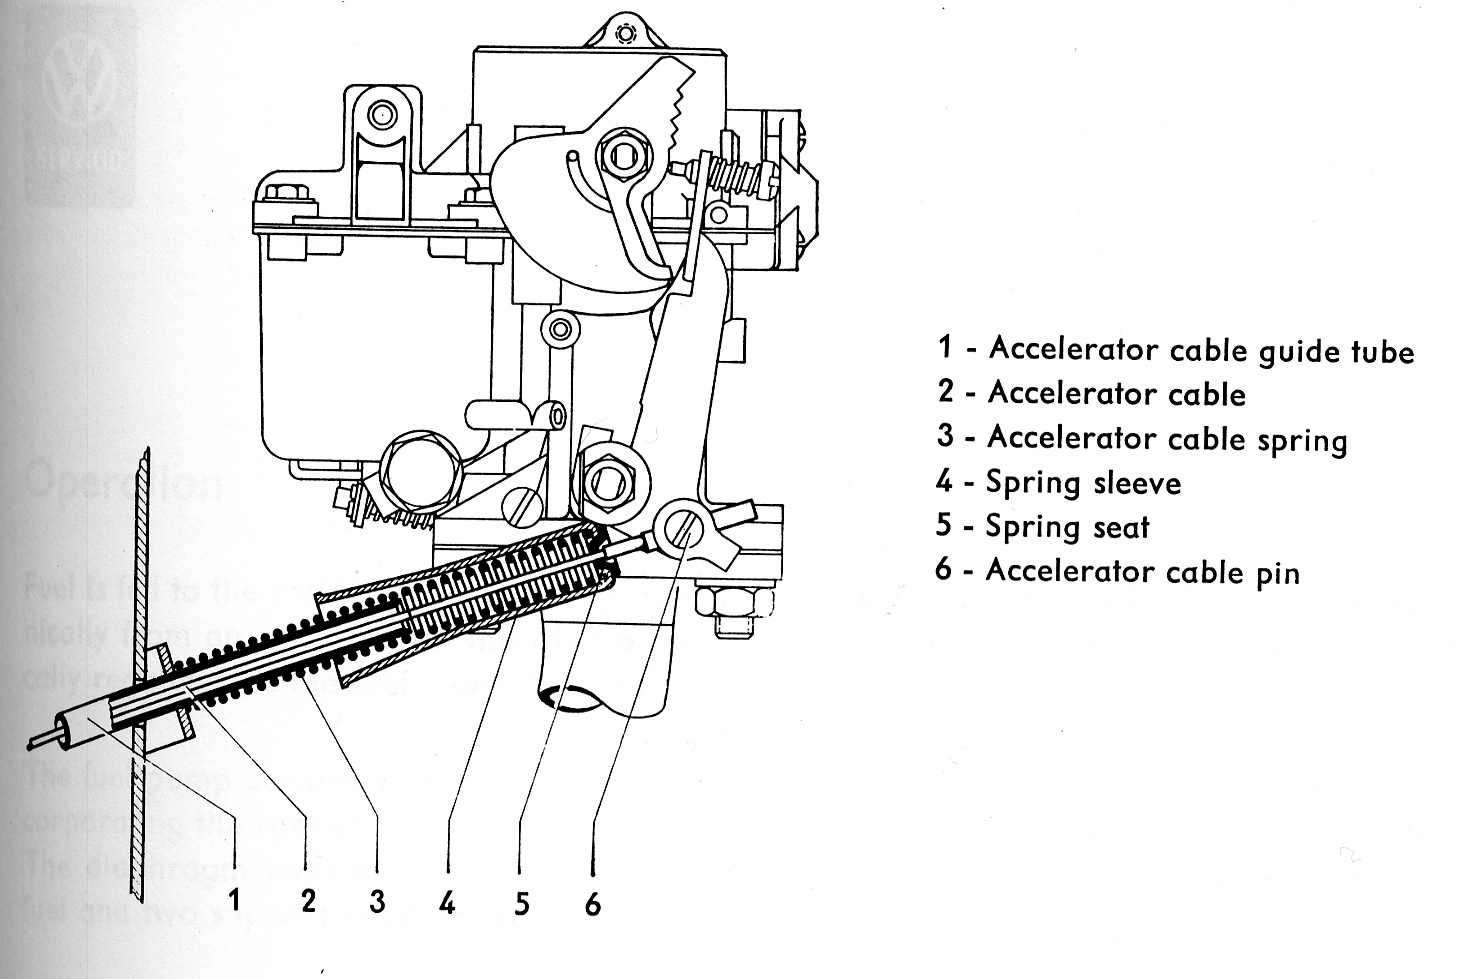 thesamba com beetle 1958 1967 view topic accelerator cable rh thesamba com 1974 VW Carburetor Adjustment VW Weber Carburetor